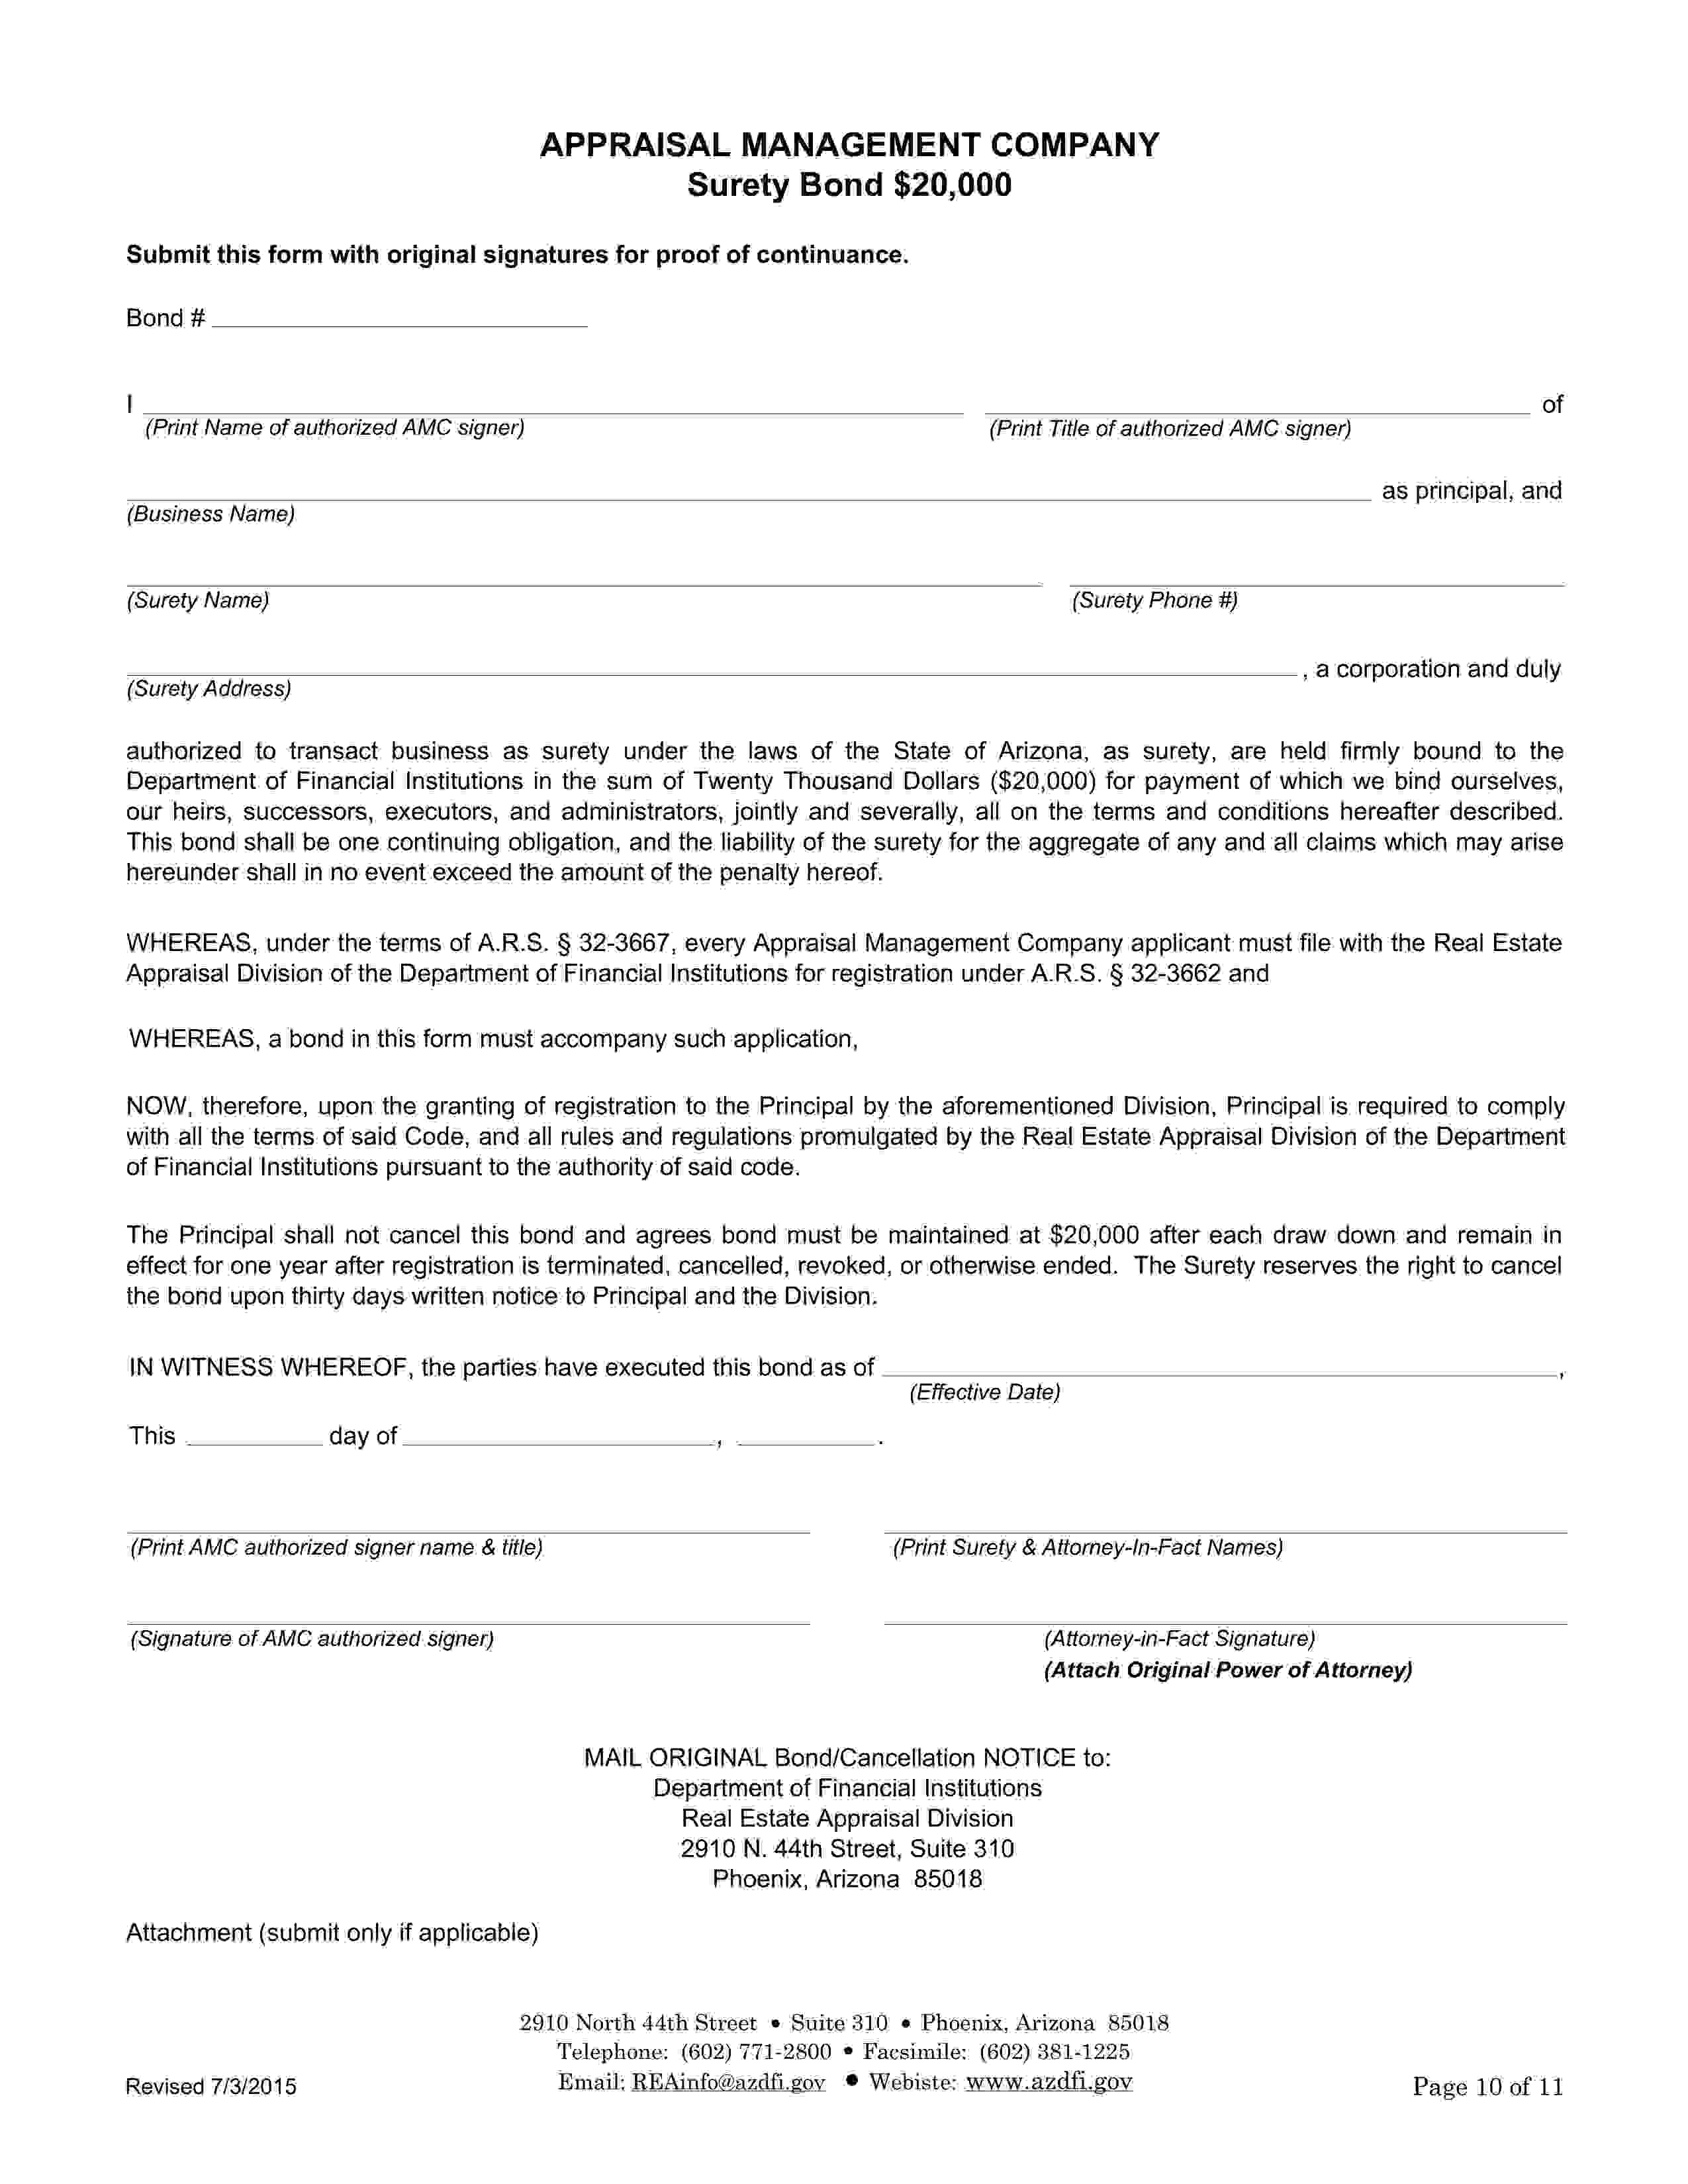 Appraisal Management Company sample image